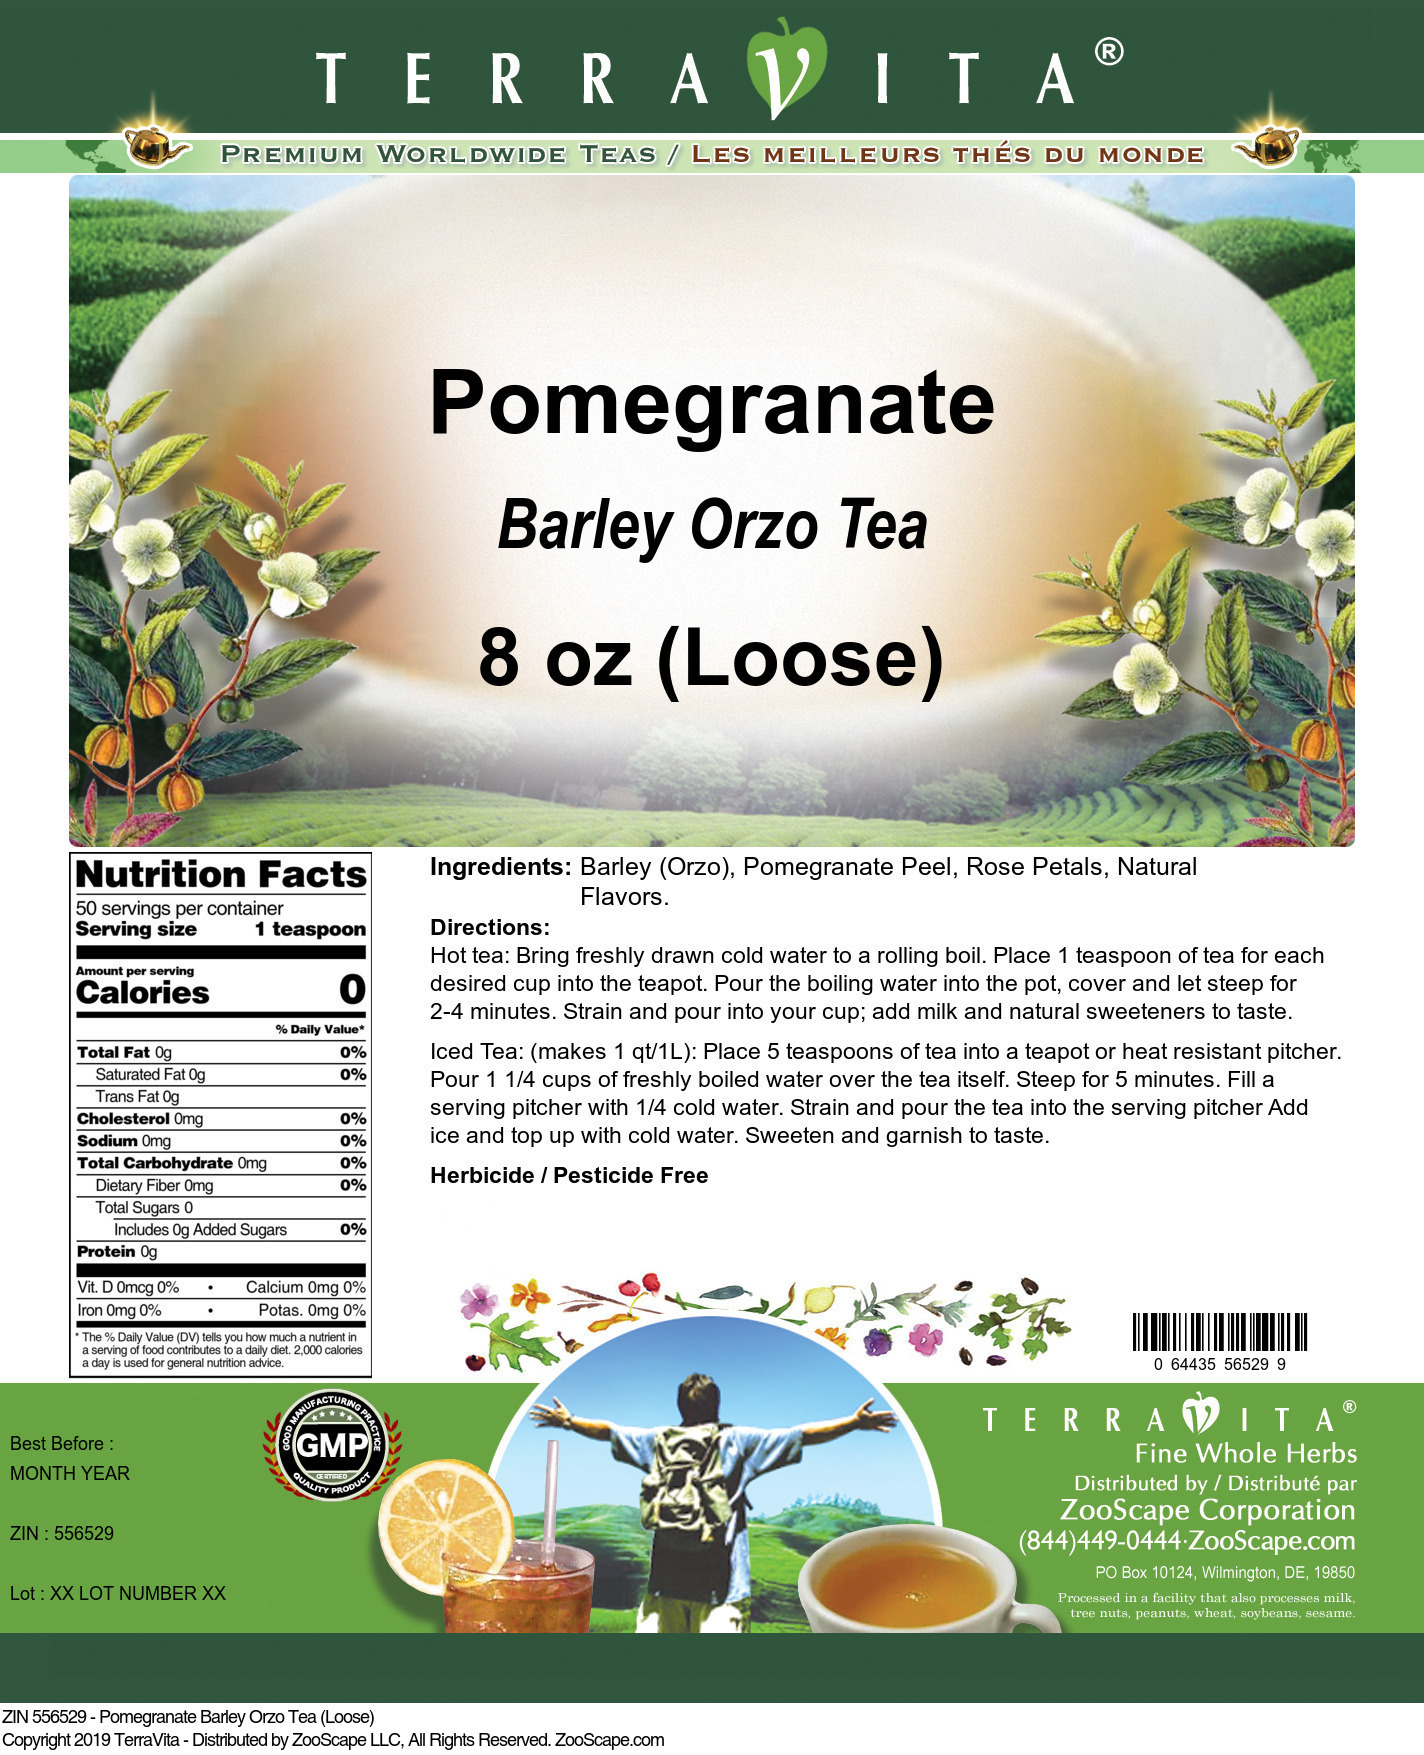 Pomegranate Barley Orzo Tea (Loose)